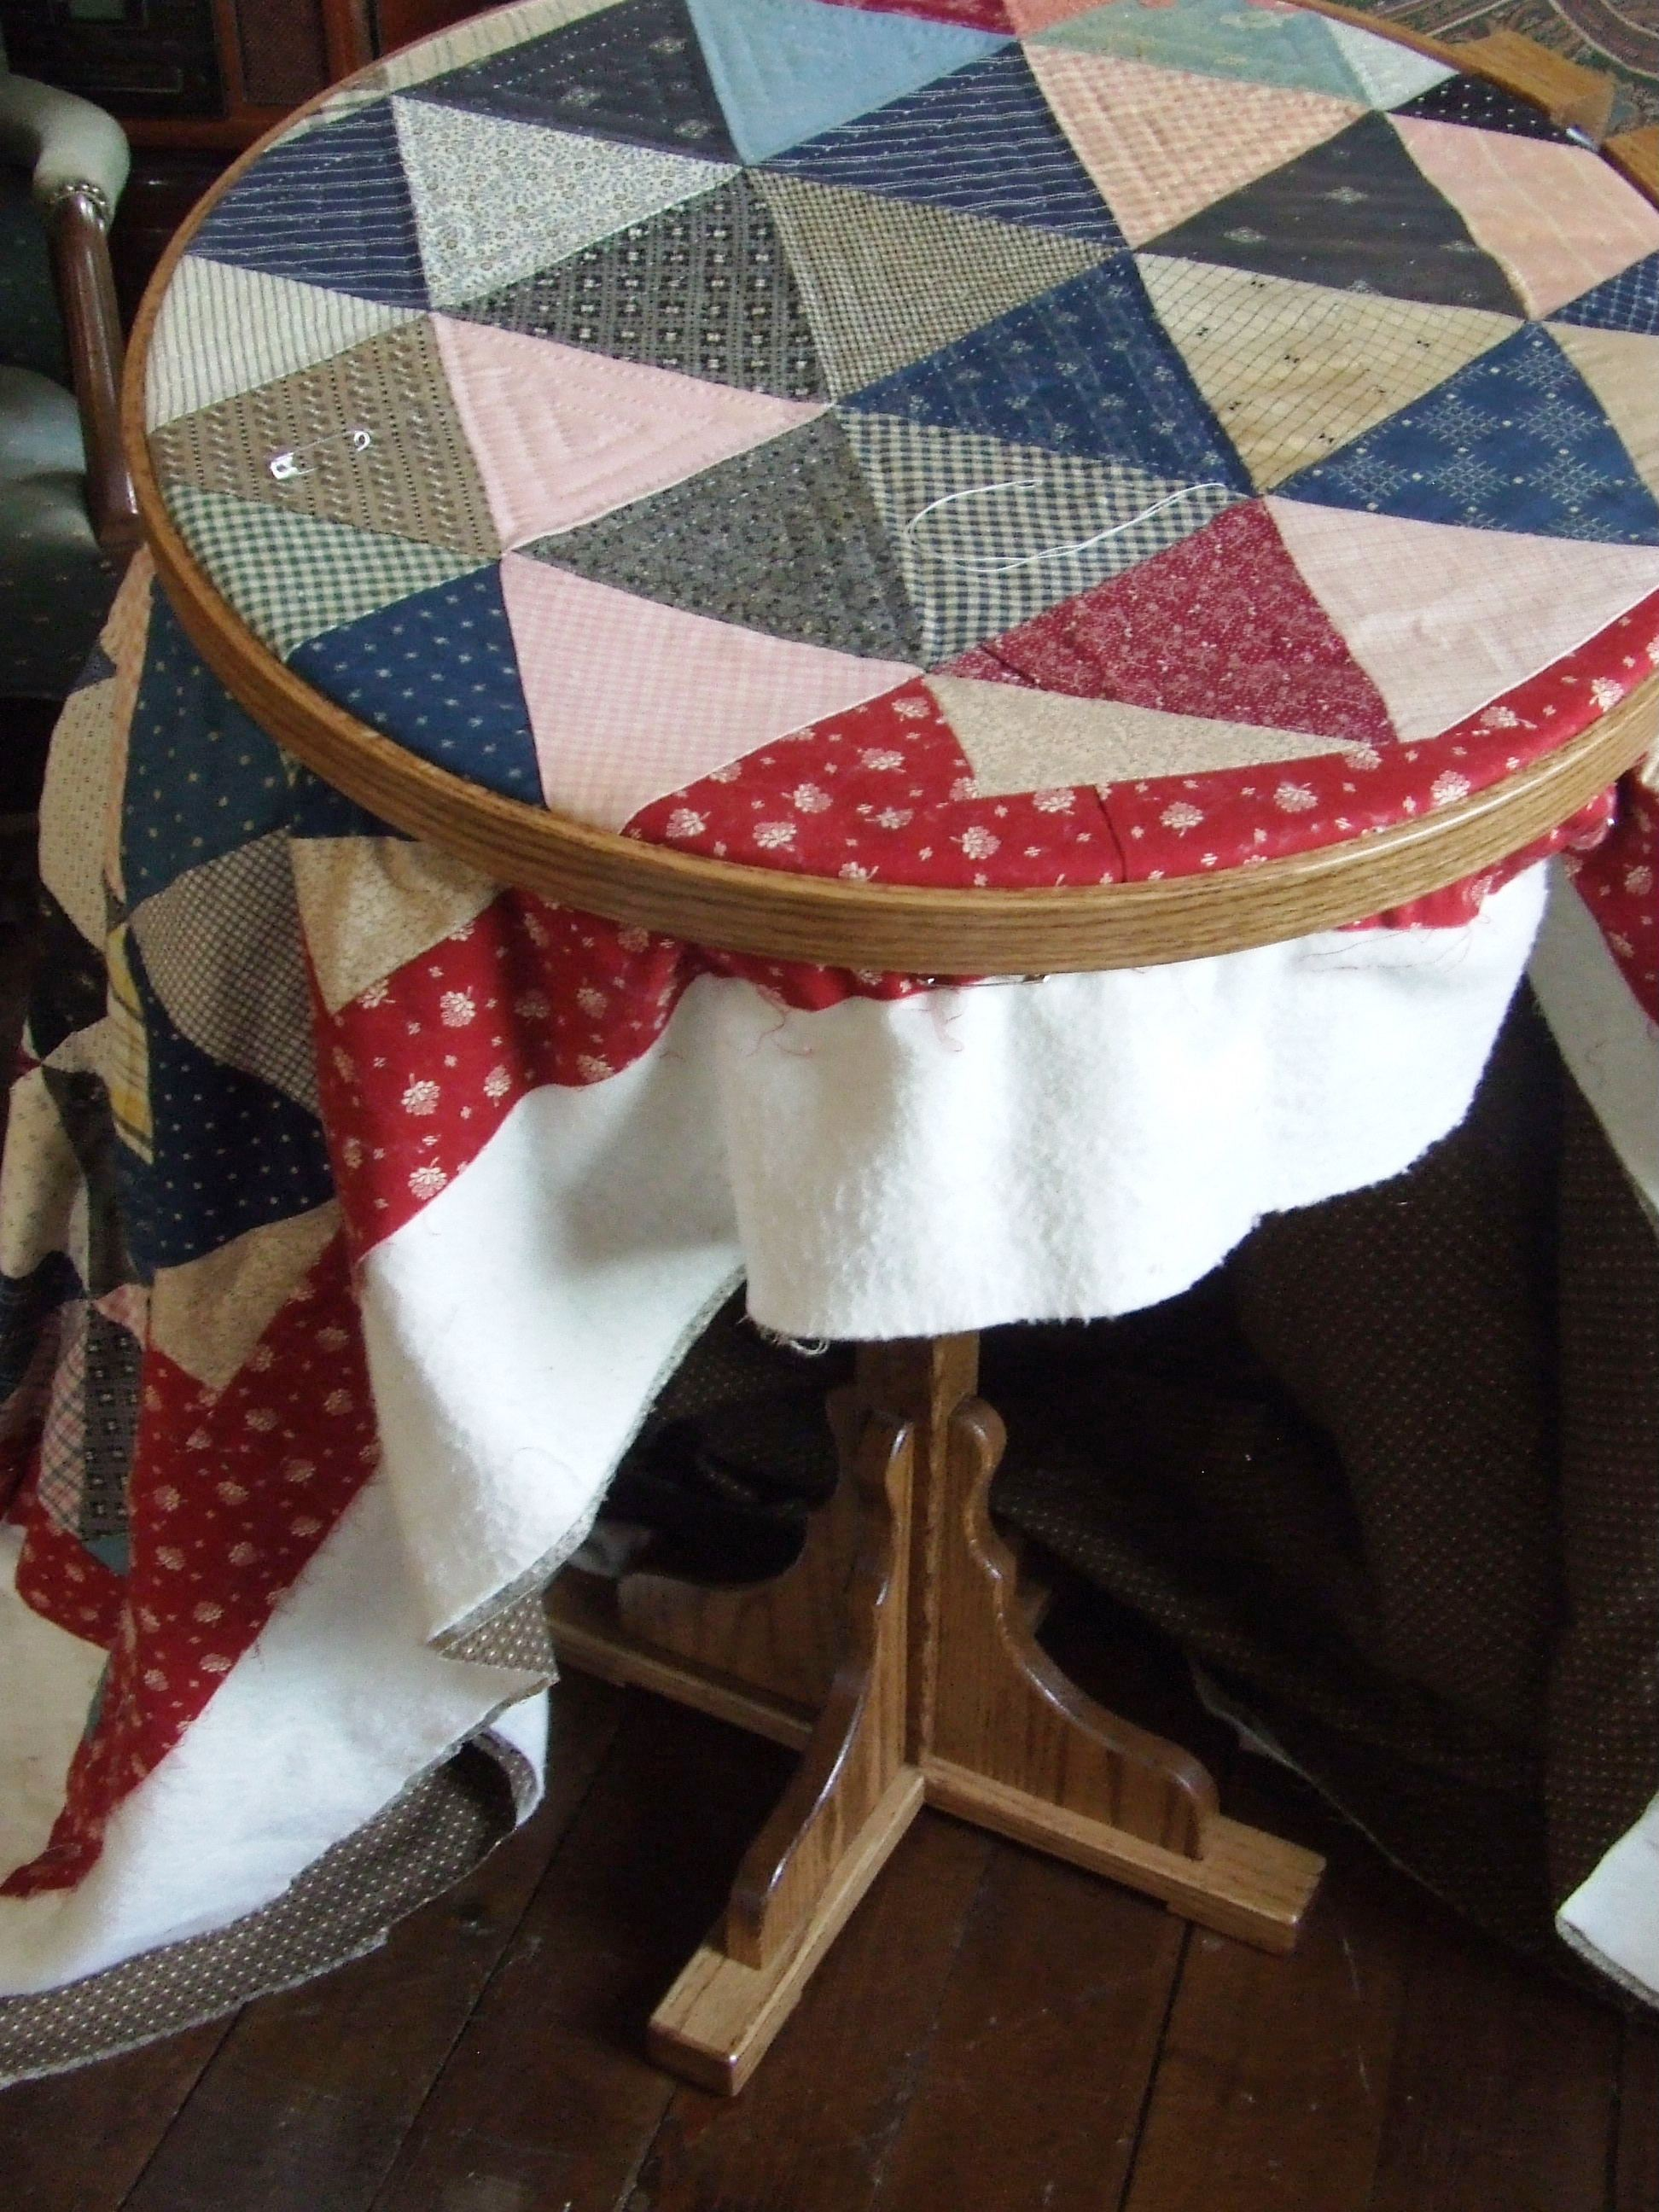 quilt hoop | Tim Latimer - Quilts etc : grace quilting hoop - Adamdwight.com